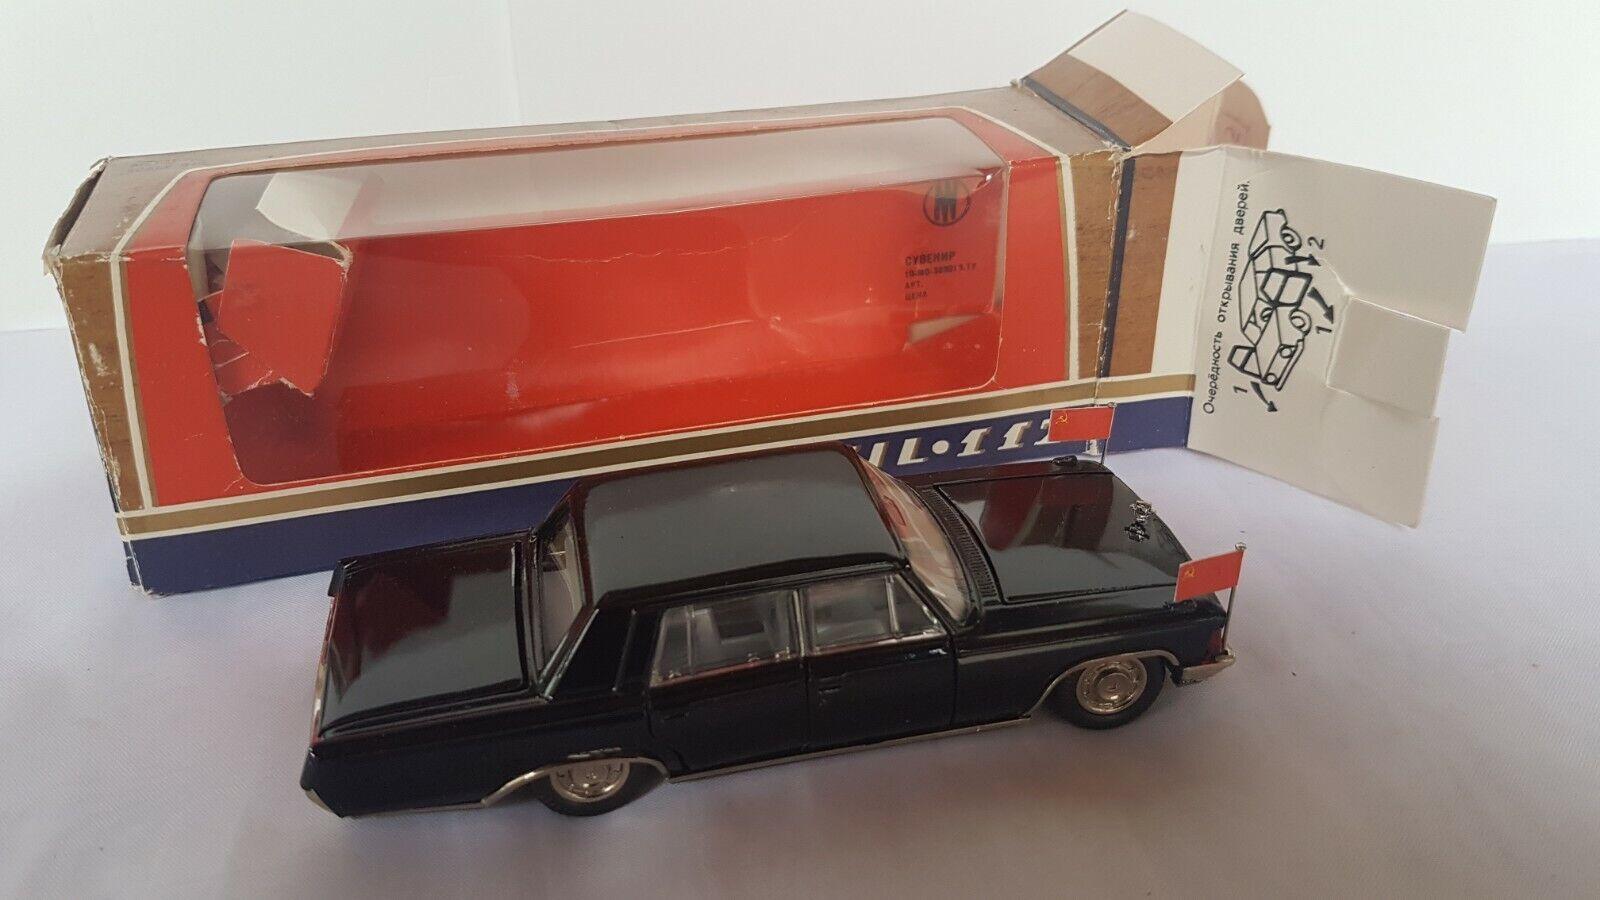 1 43 Limousine ZIL 117 mit Standarten UdSSR USSR CCCP OVP